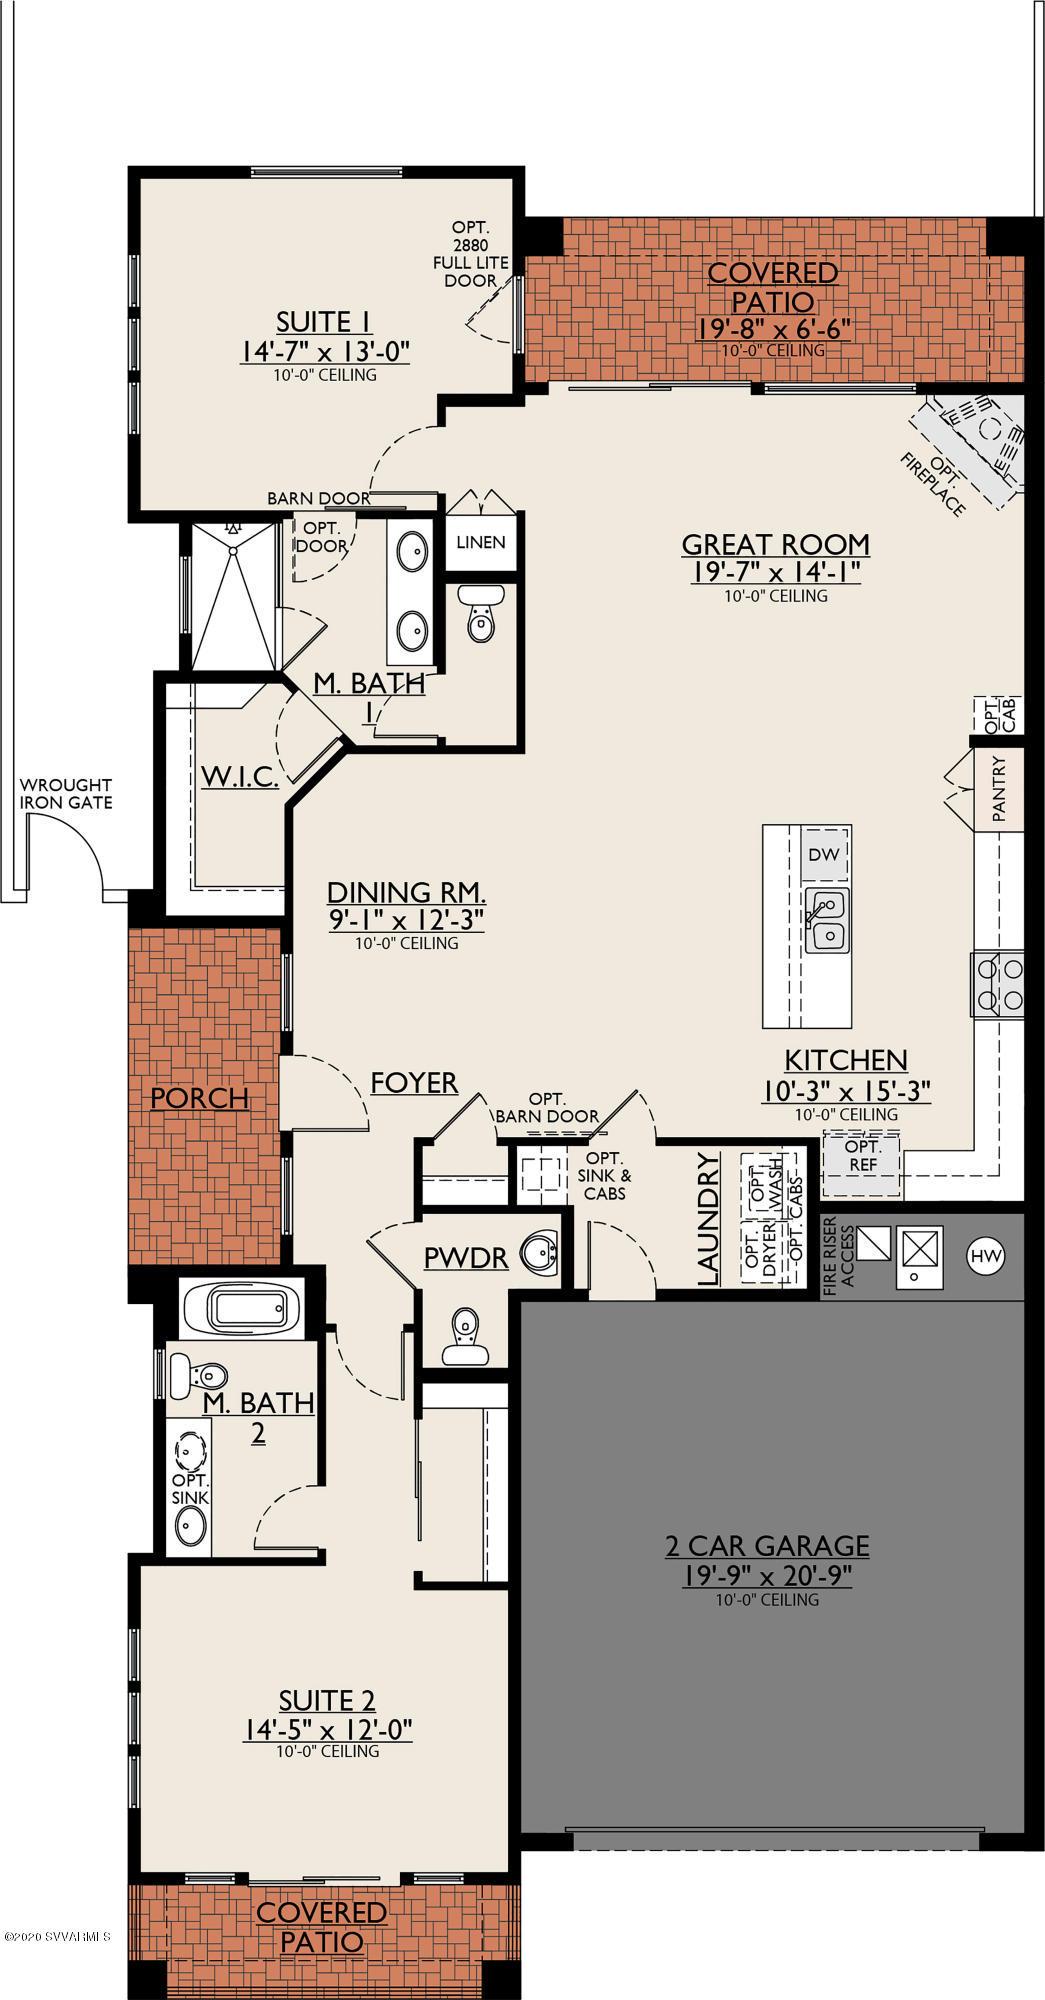 3902 Positano Place Sedona, AZ 86336